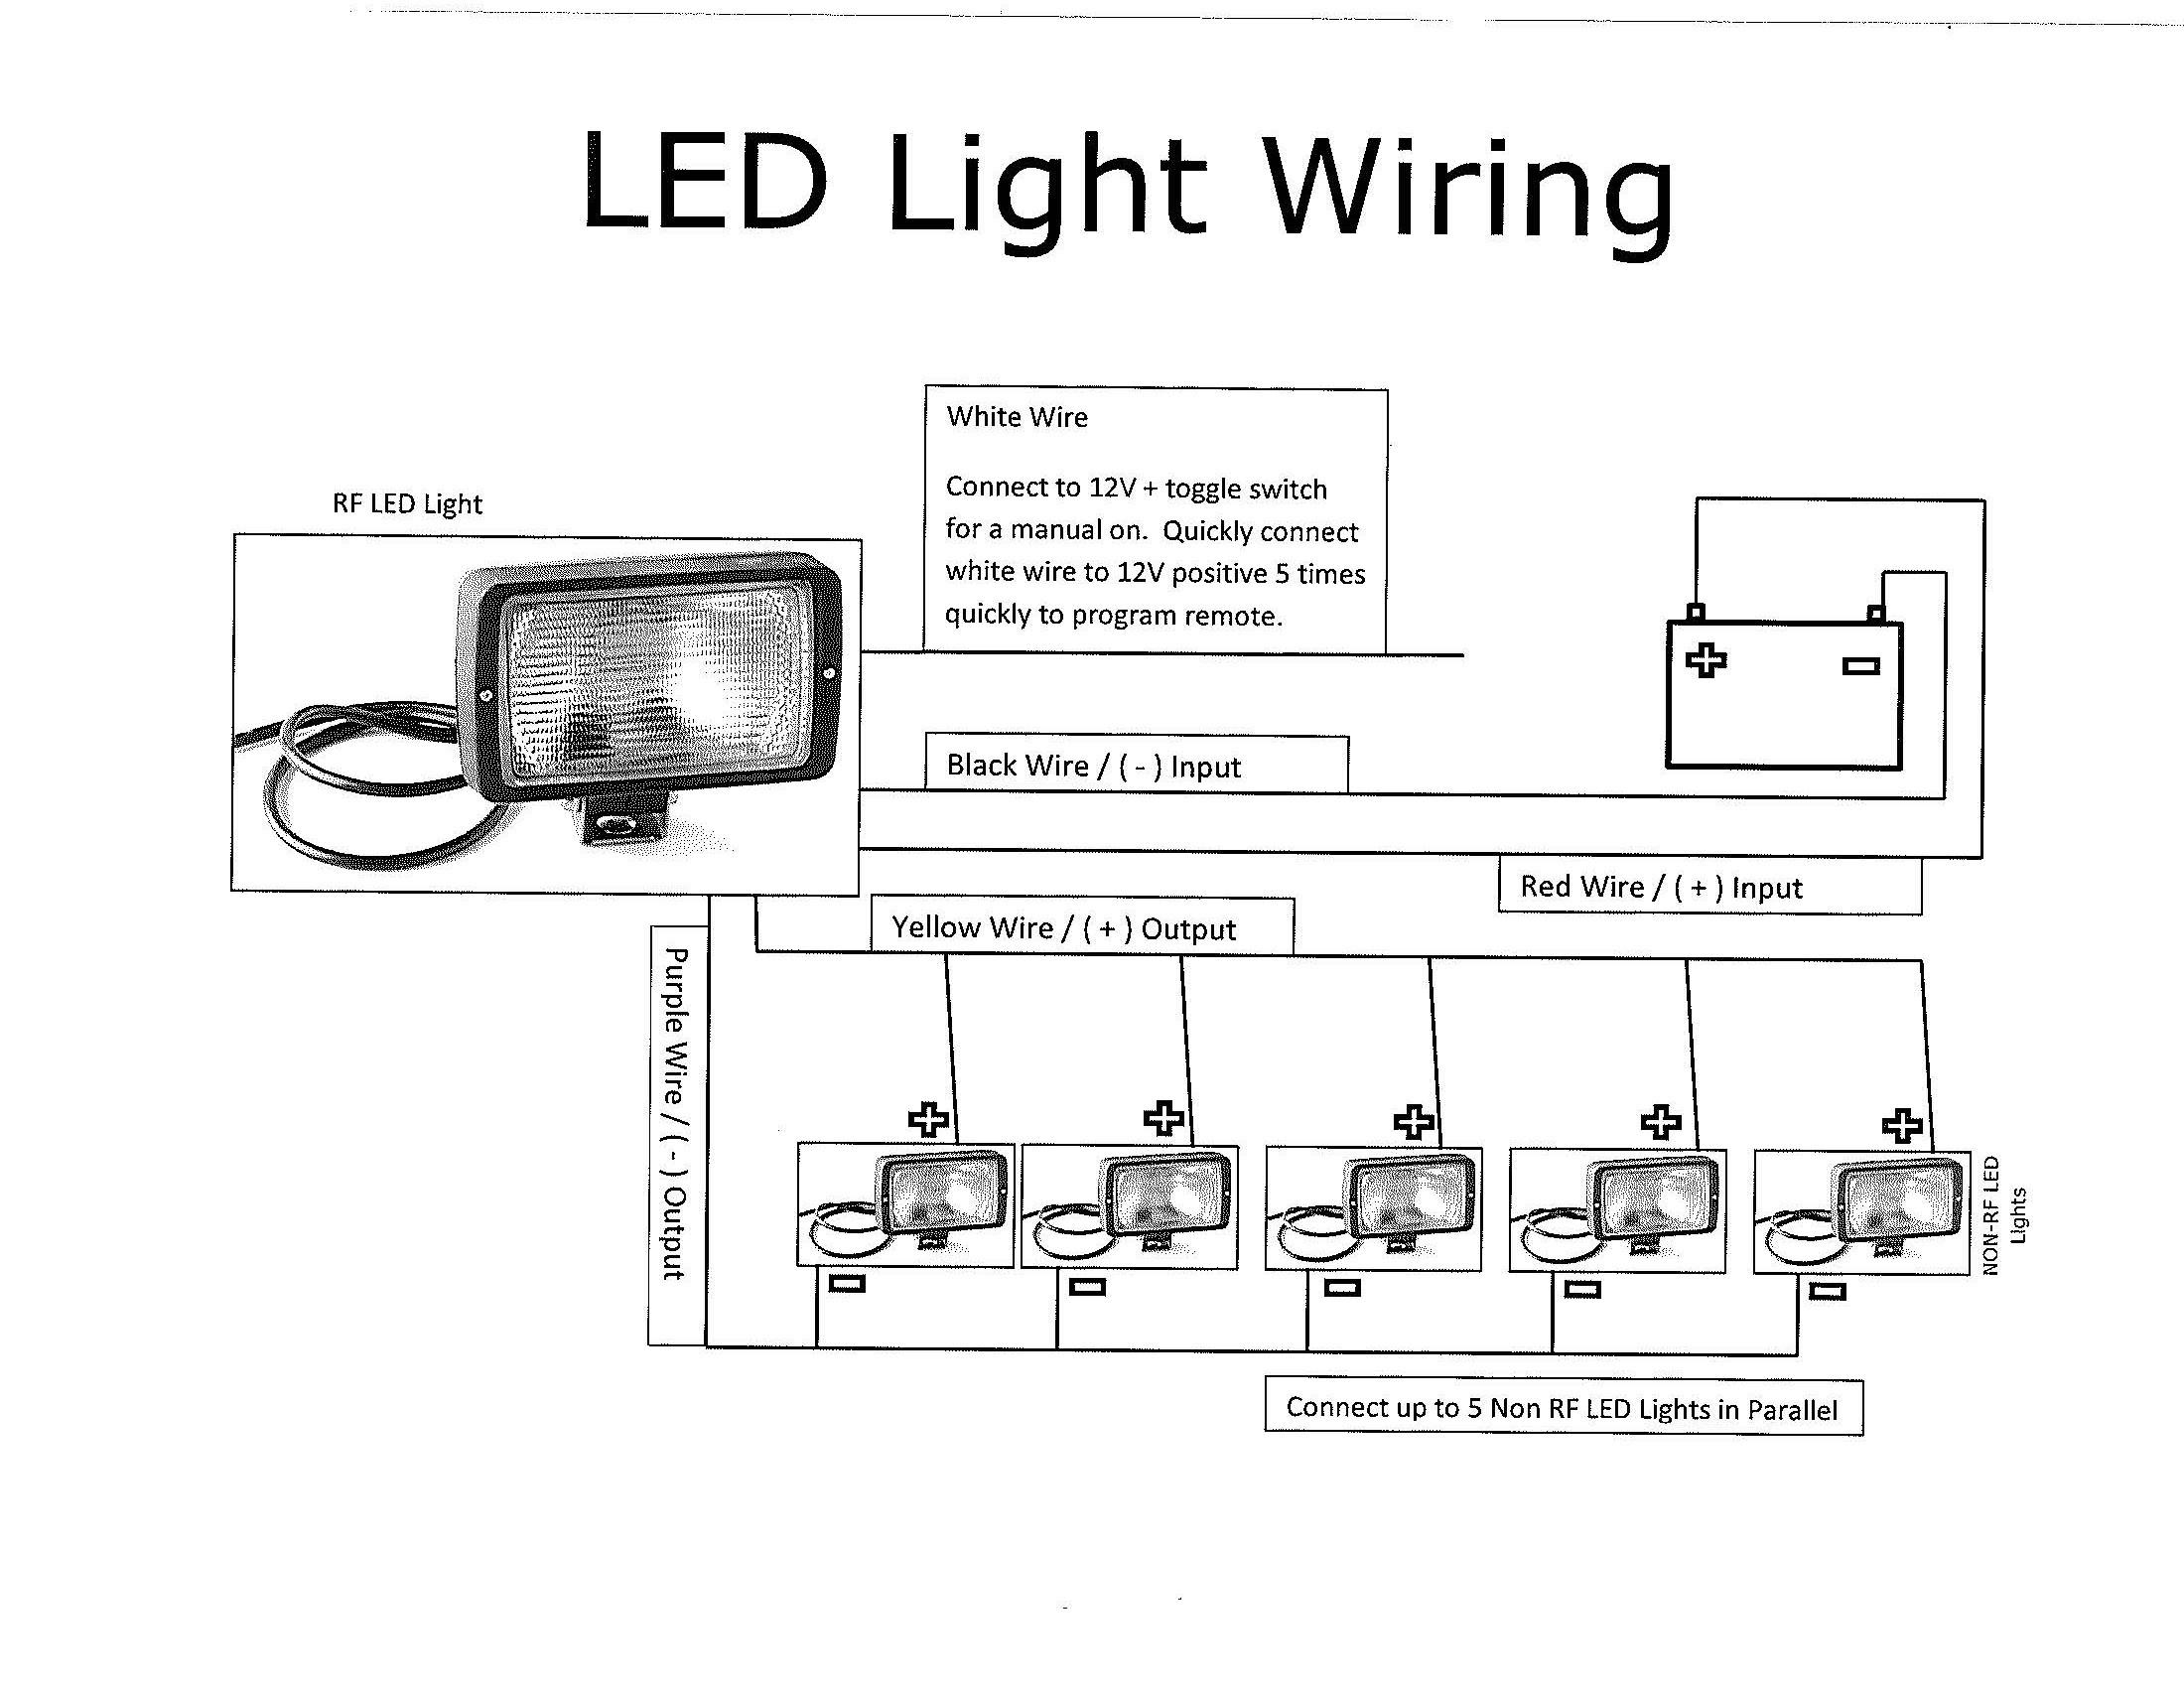 5 Wire Led Diagram | Wiring Diagram - Led Lighting Wiring Diagram